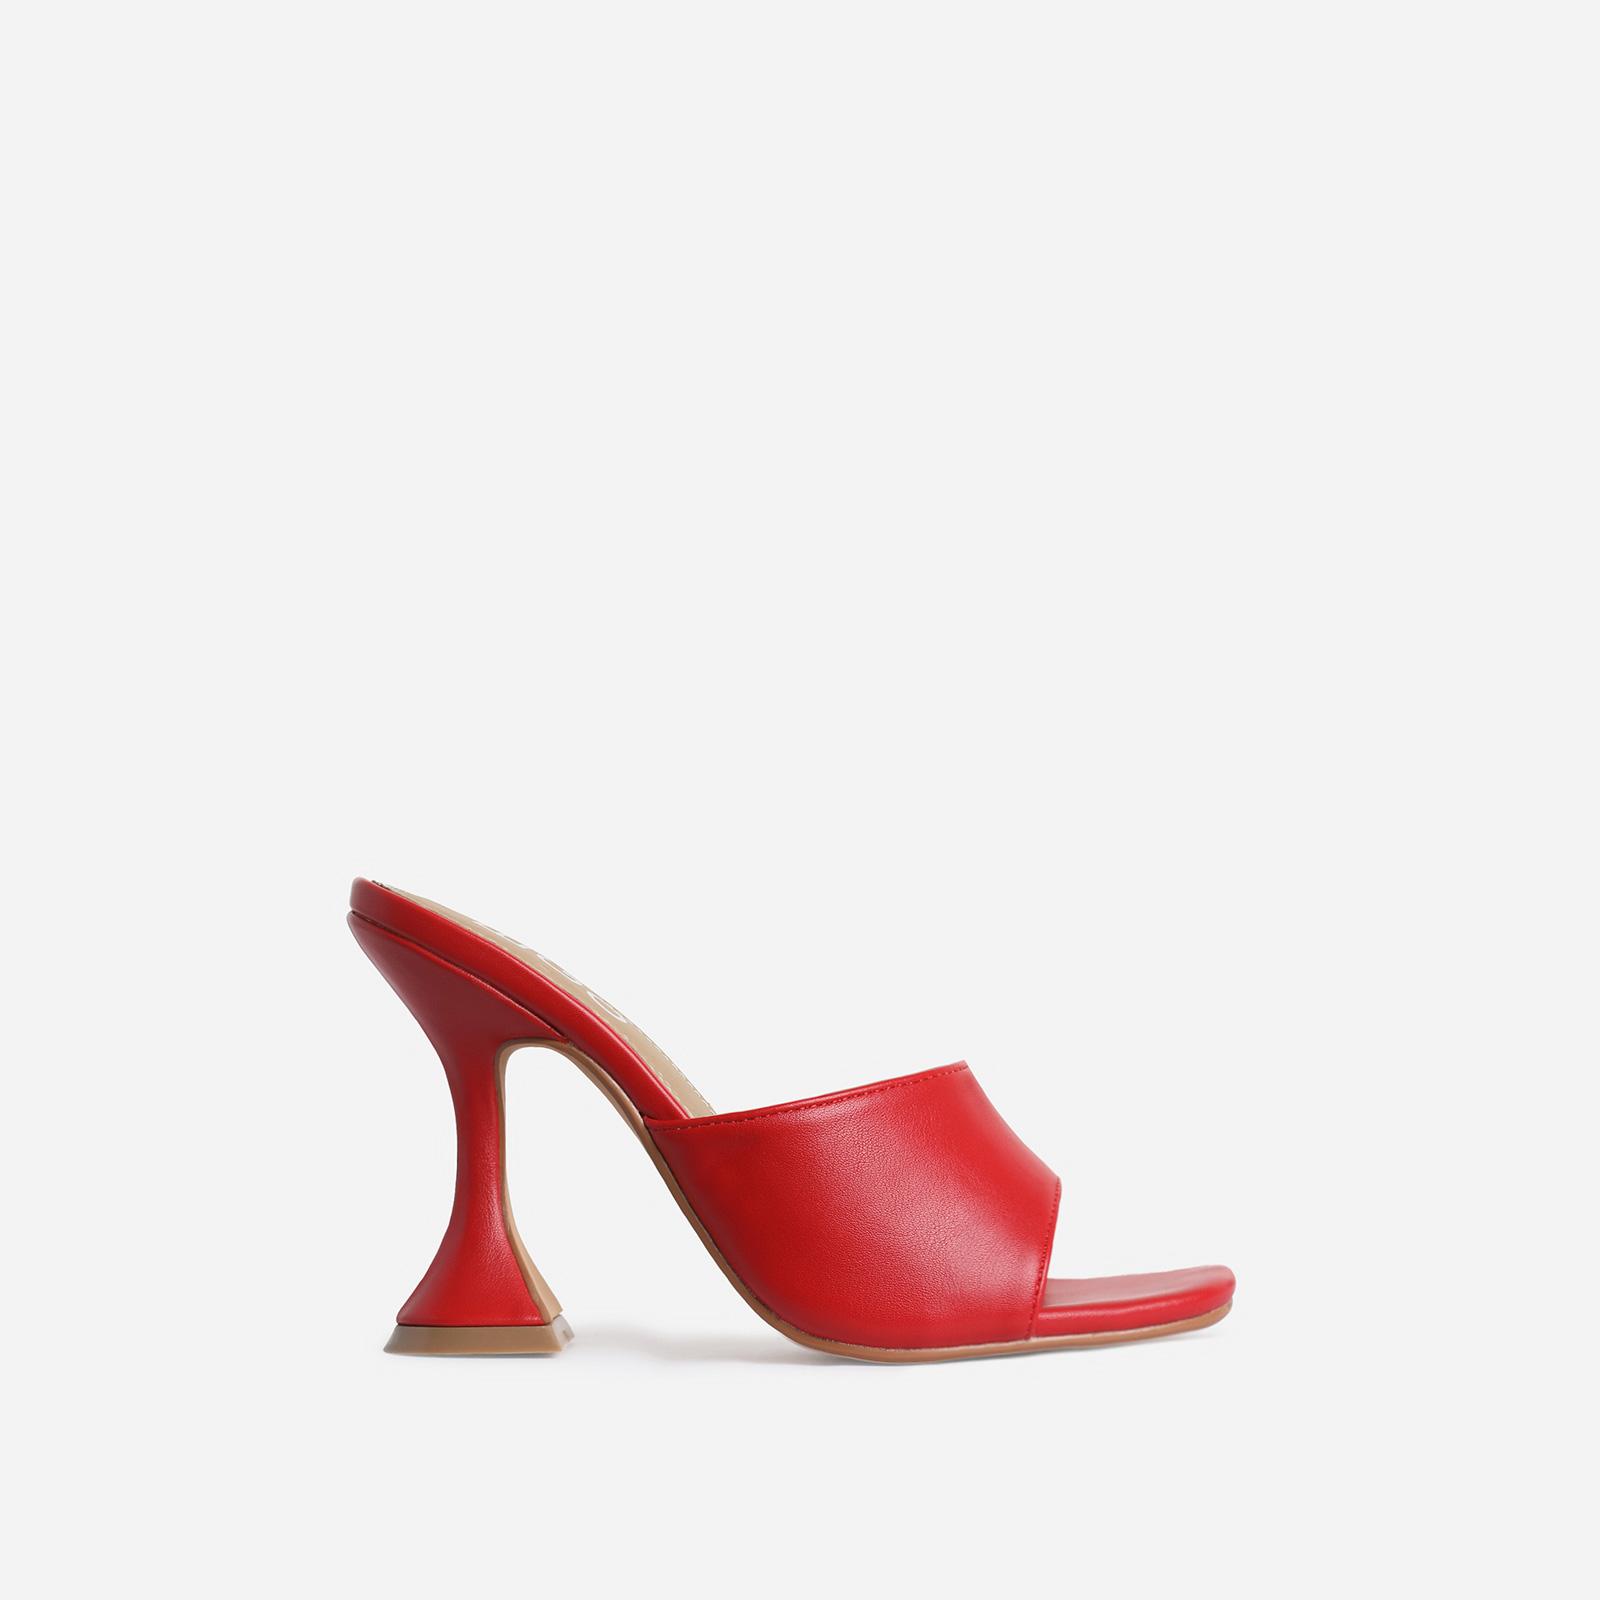 Jordi Peep Square Toe Heel Mule In Red Faux Leather